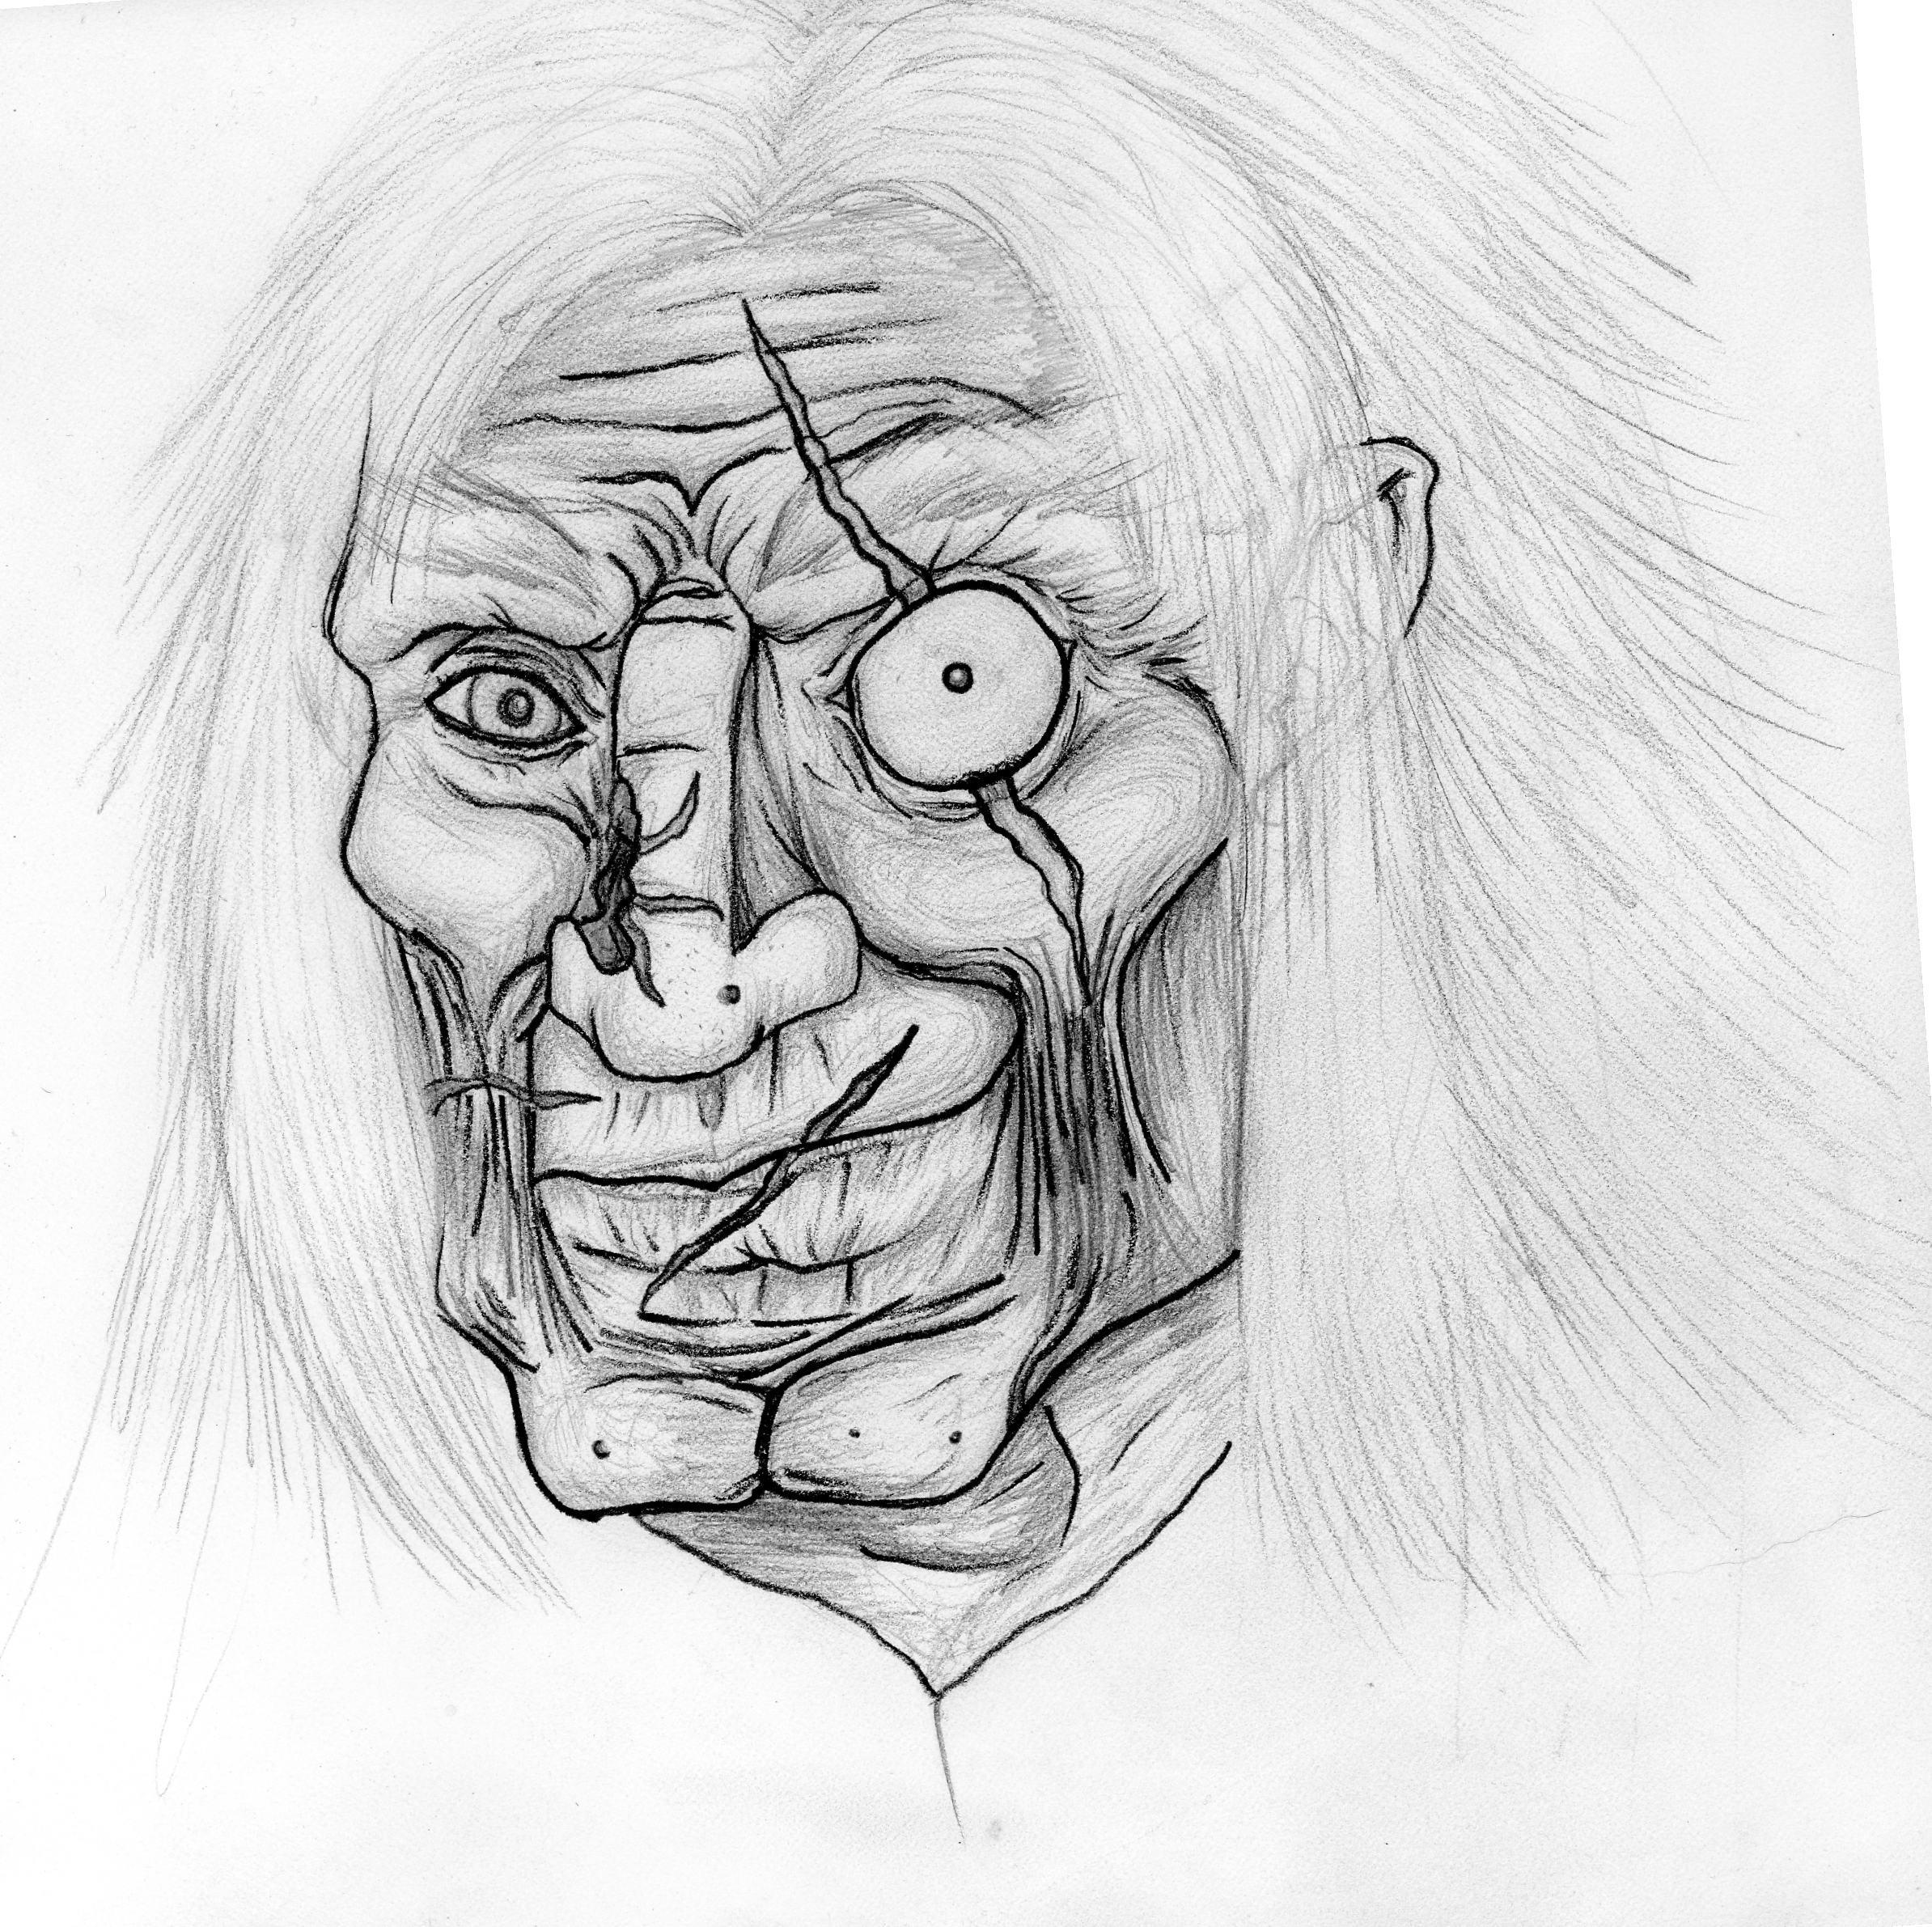 Mad-Eye Moody by Kendokata101 on DeviantArt